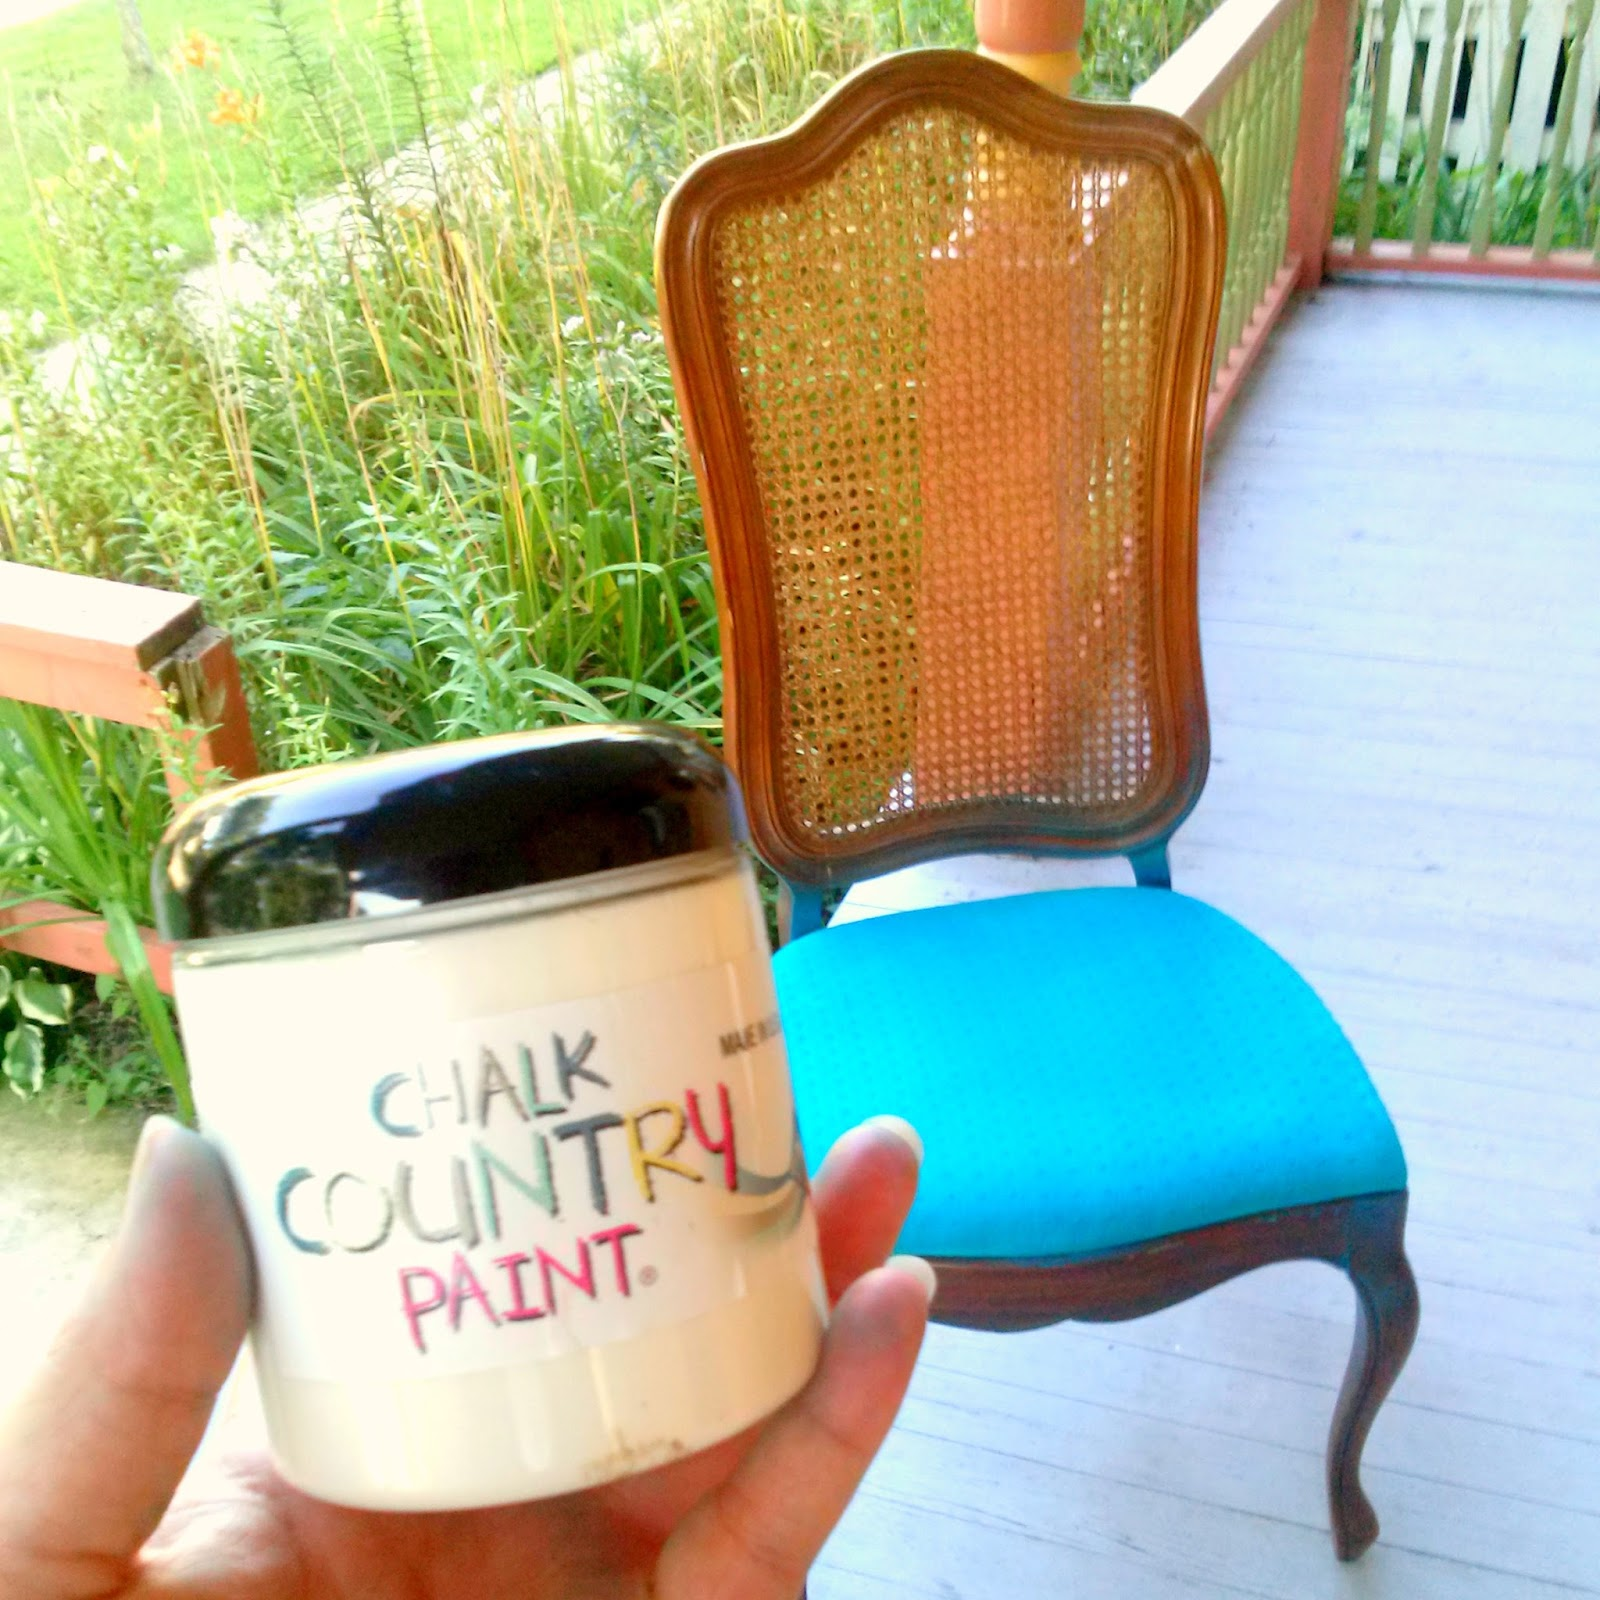 Chalk Country Paint Battle Creek